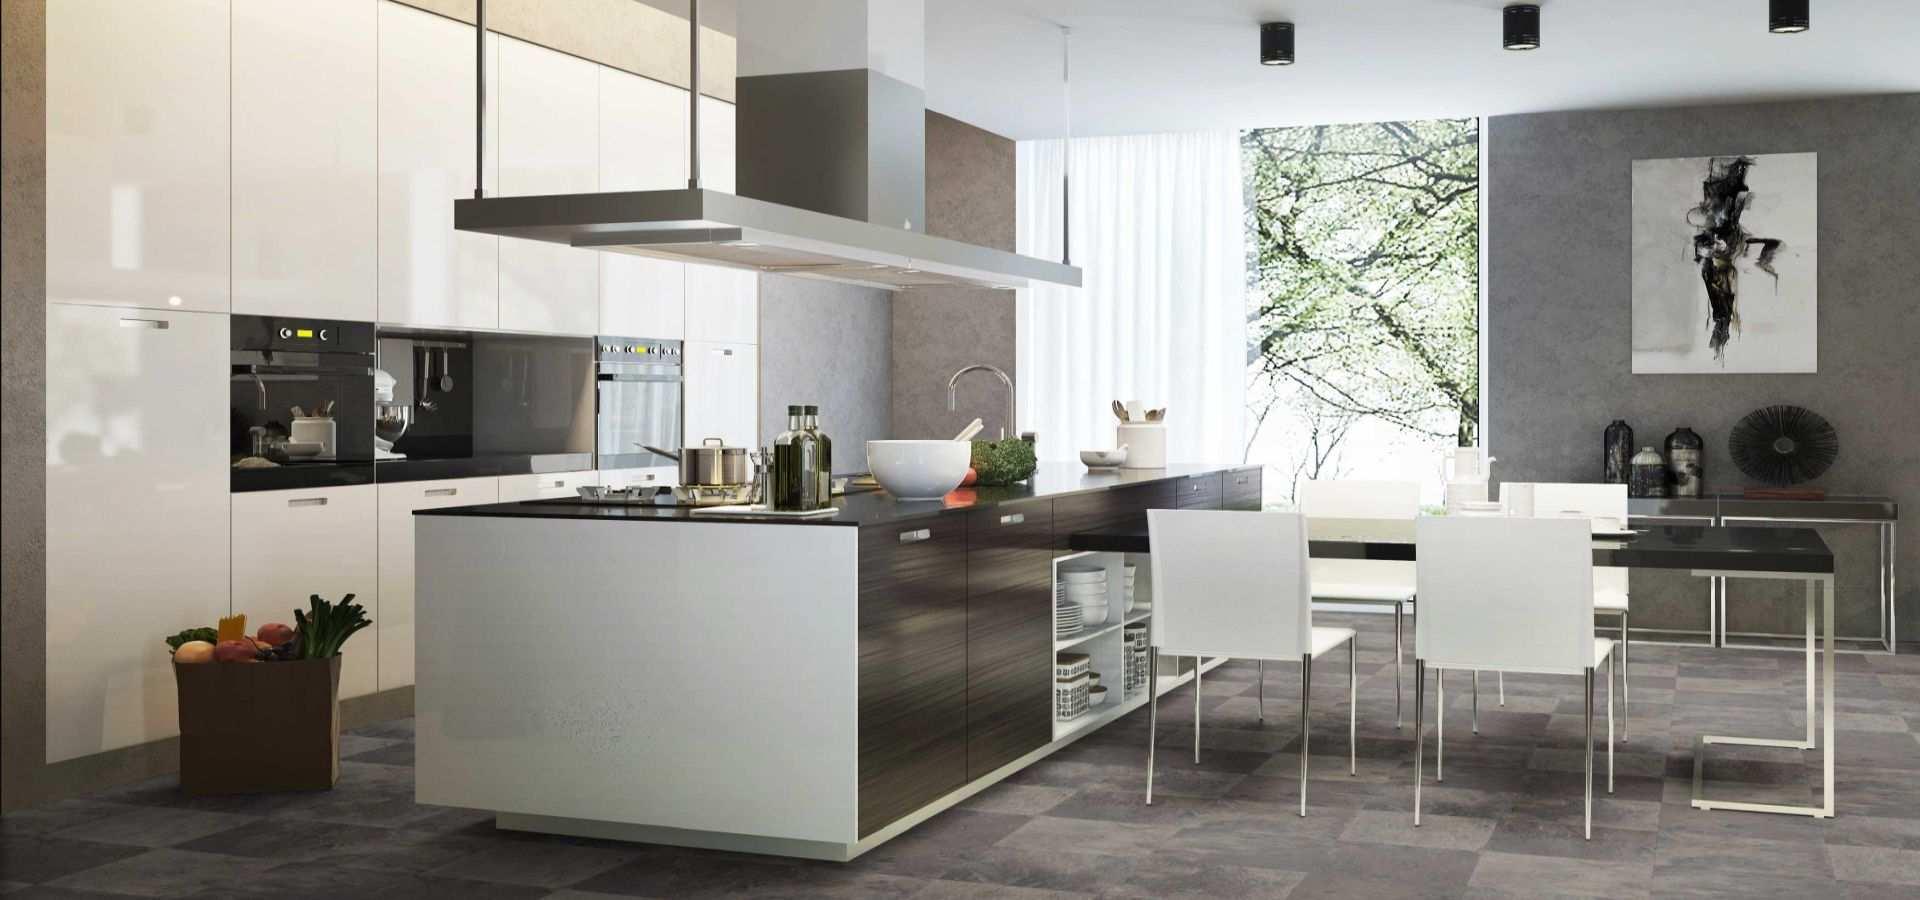 Bild Küche CV Belag Fliese Schachbrett grau beige